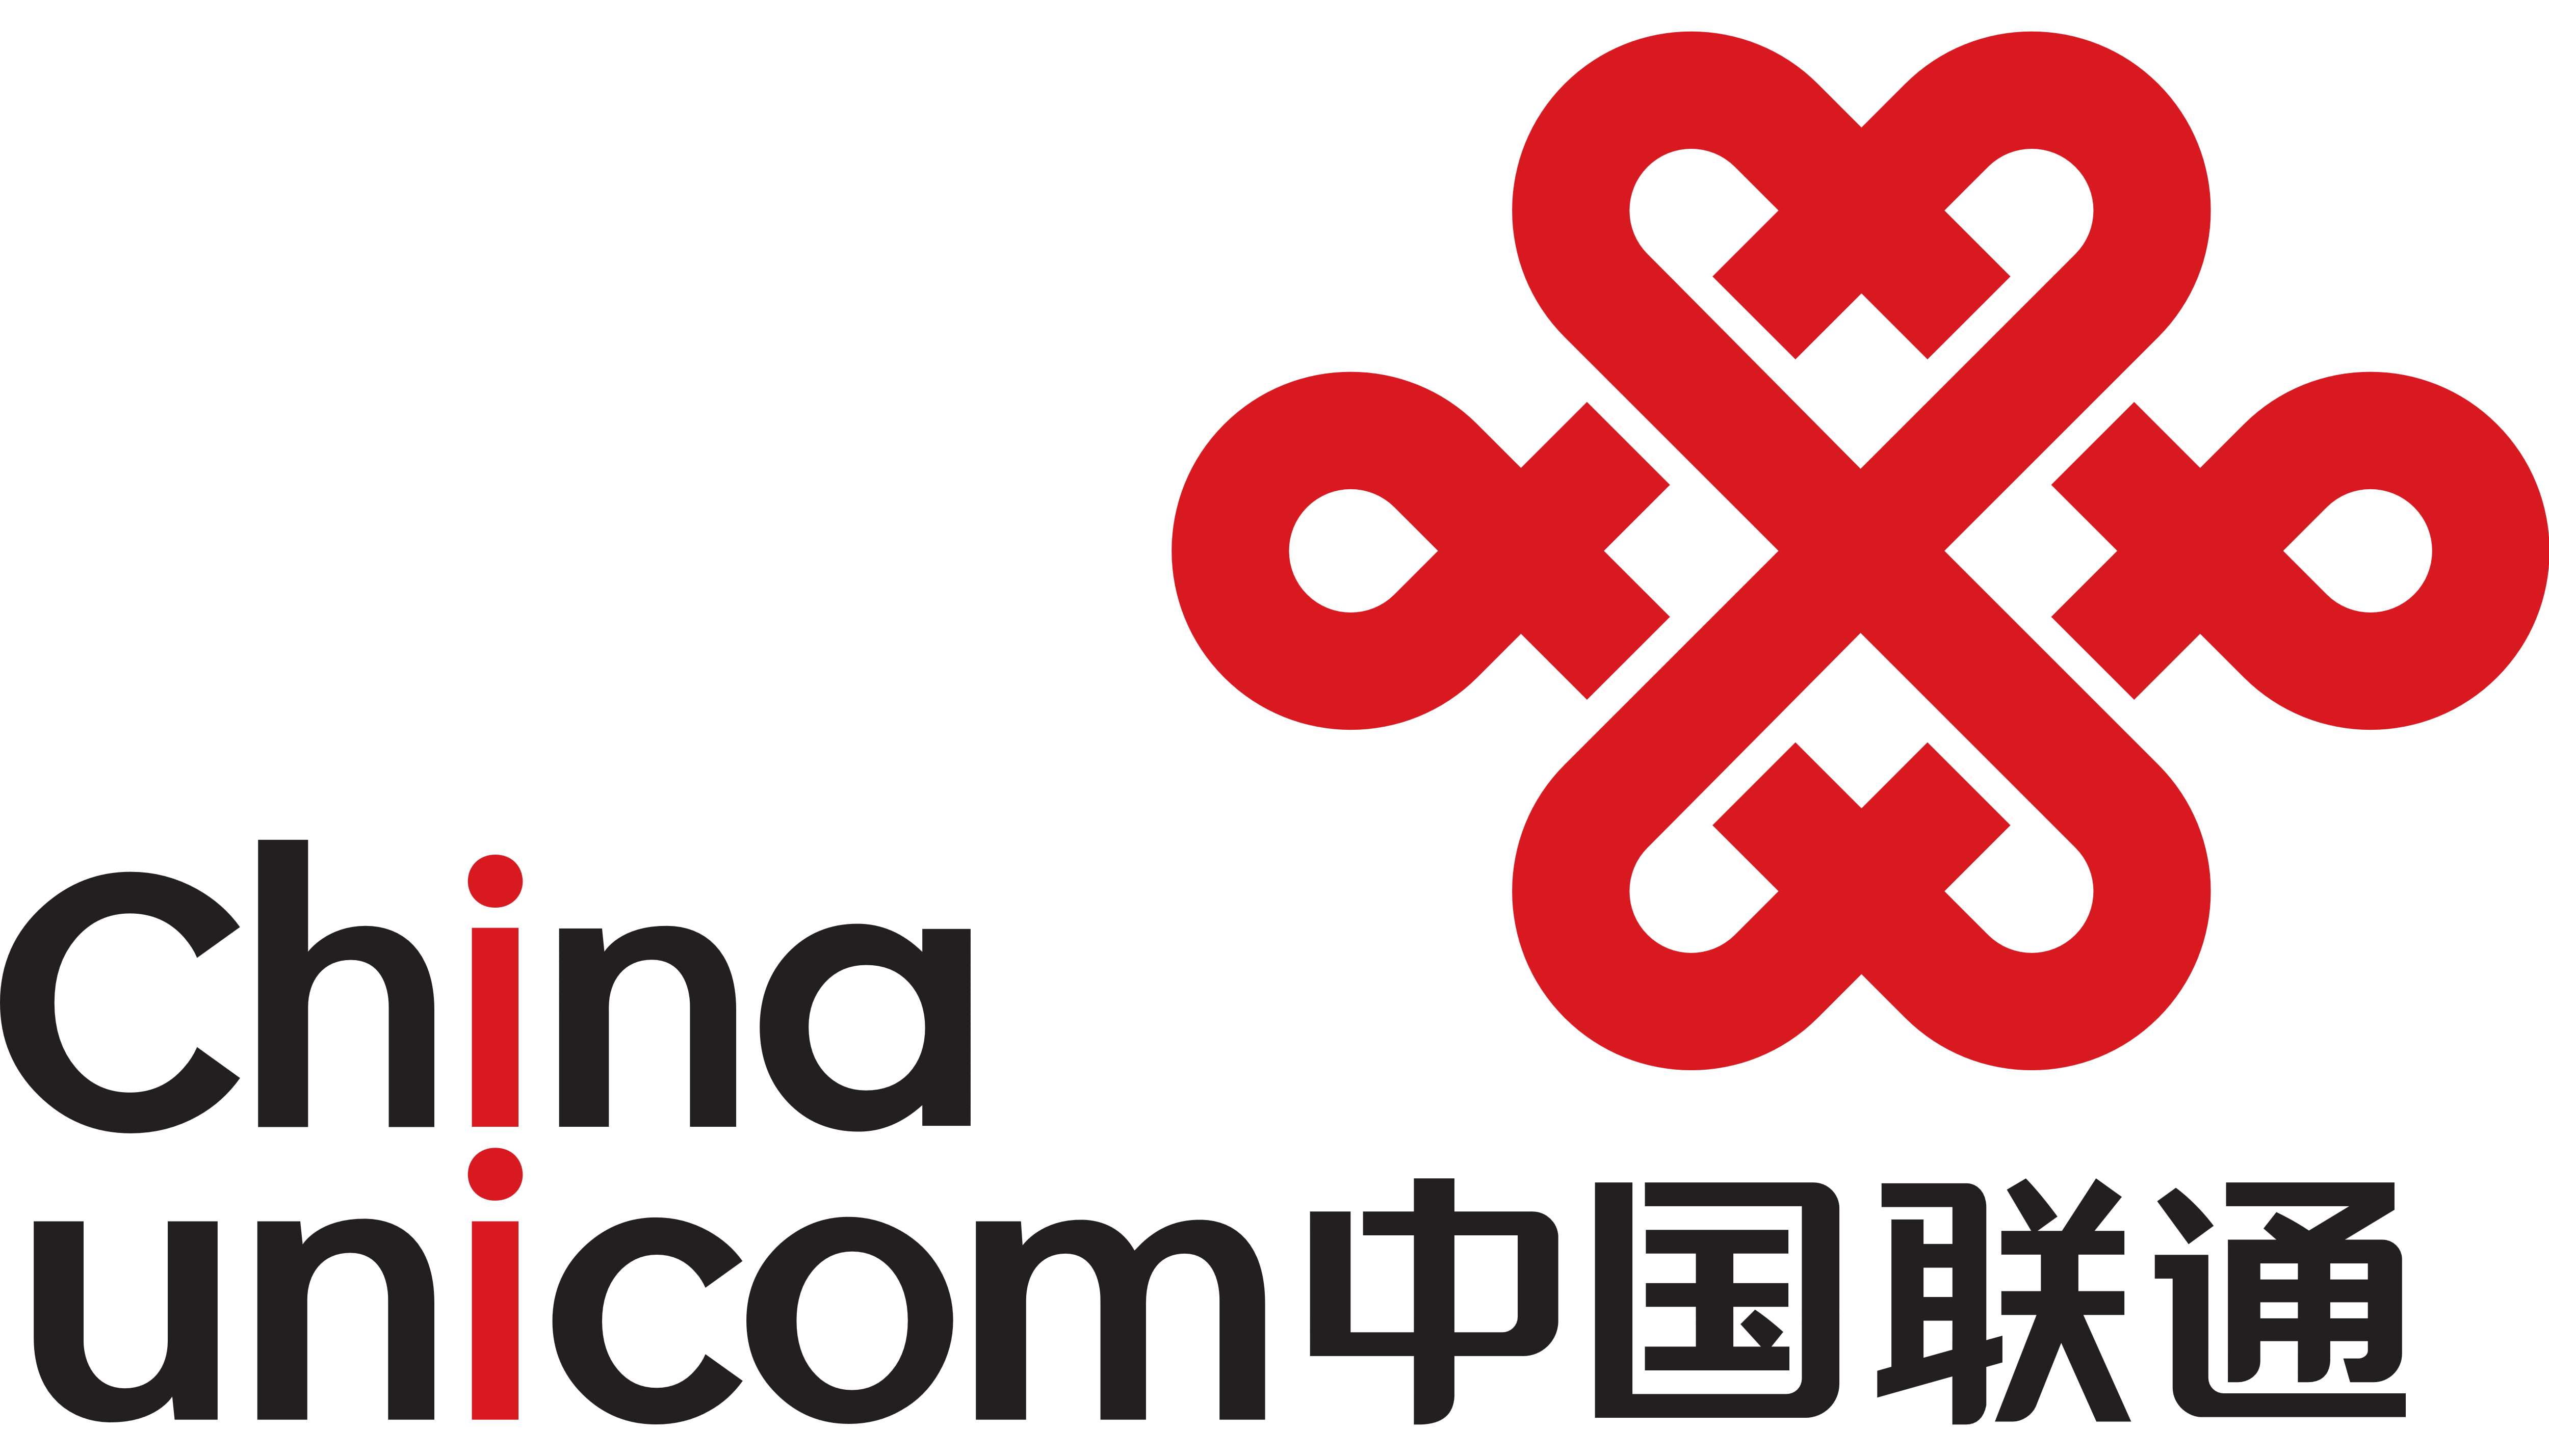 China Unicom – Logos Download